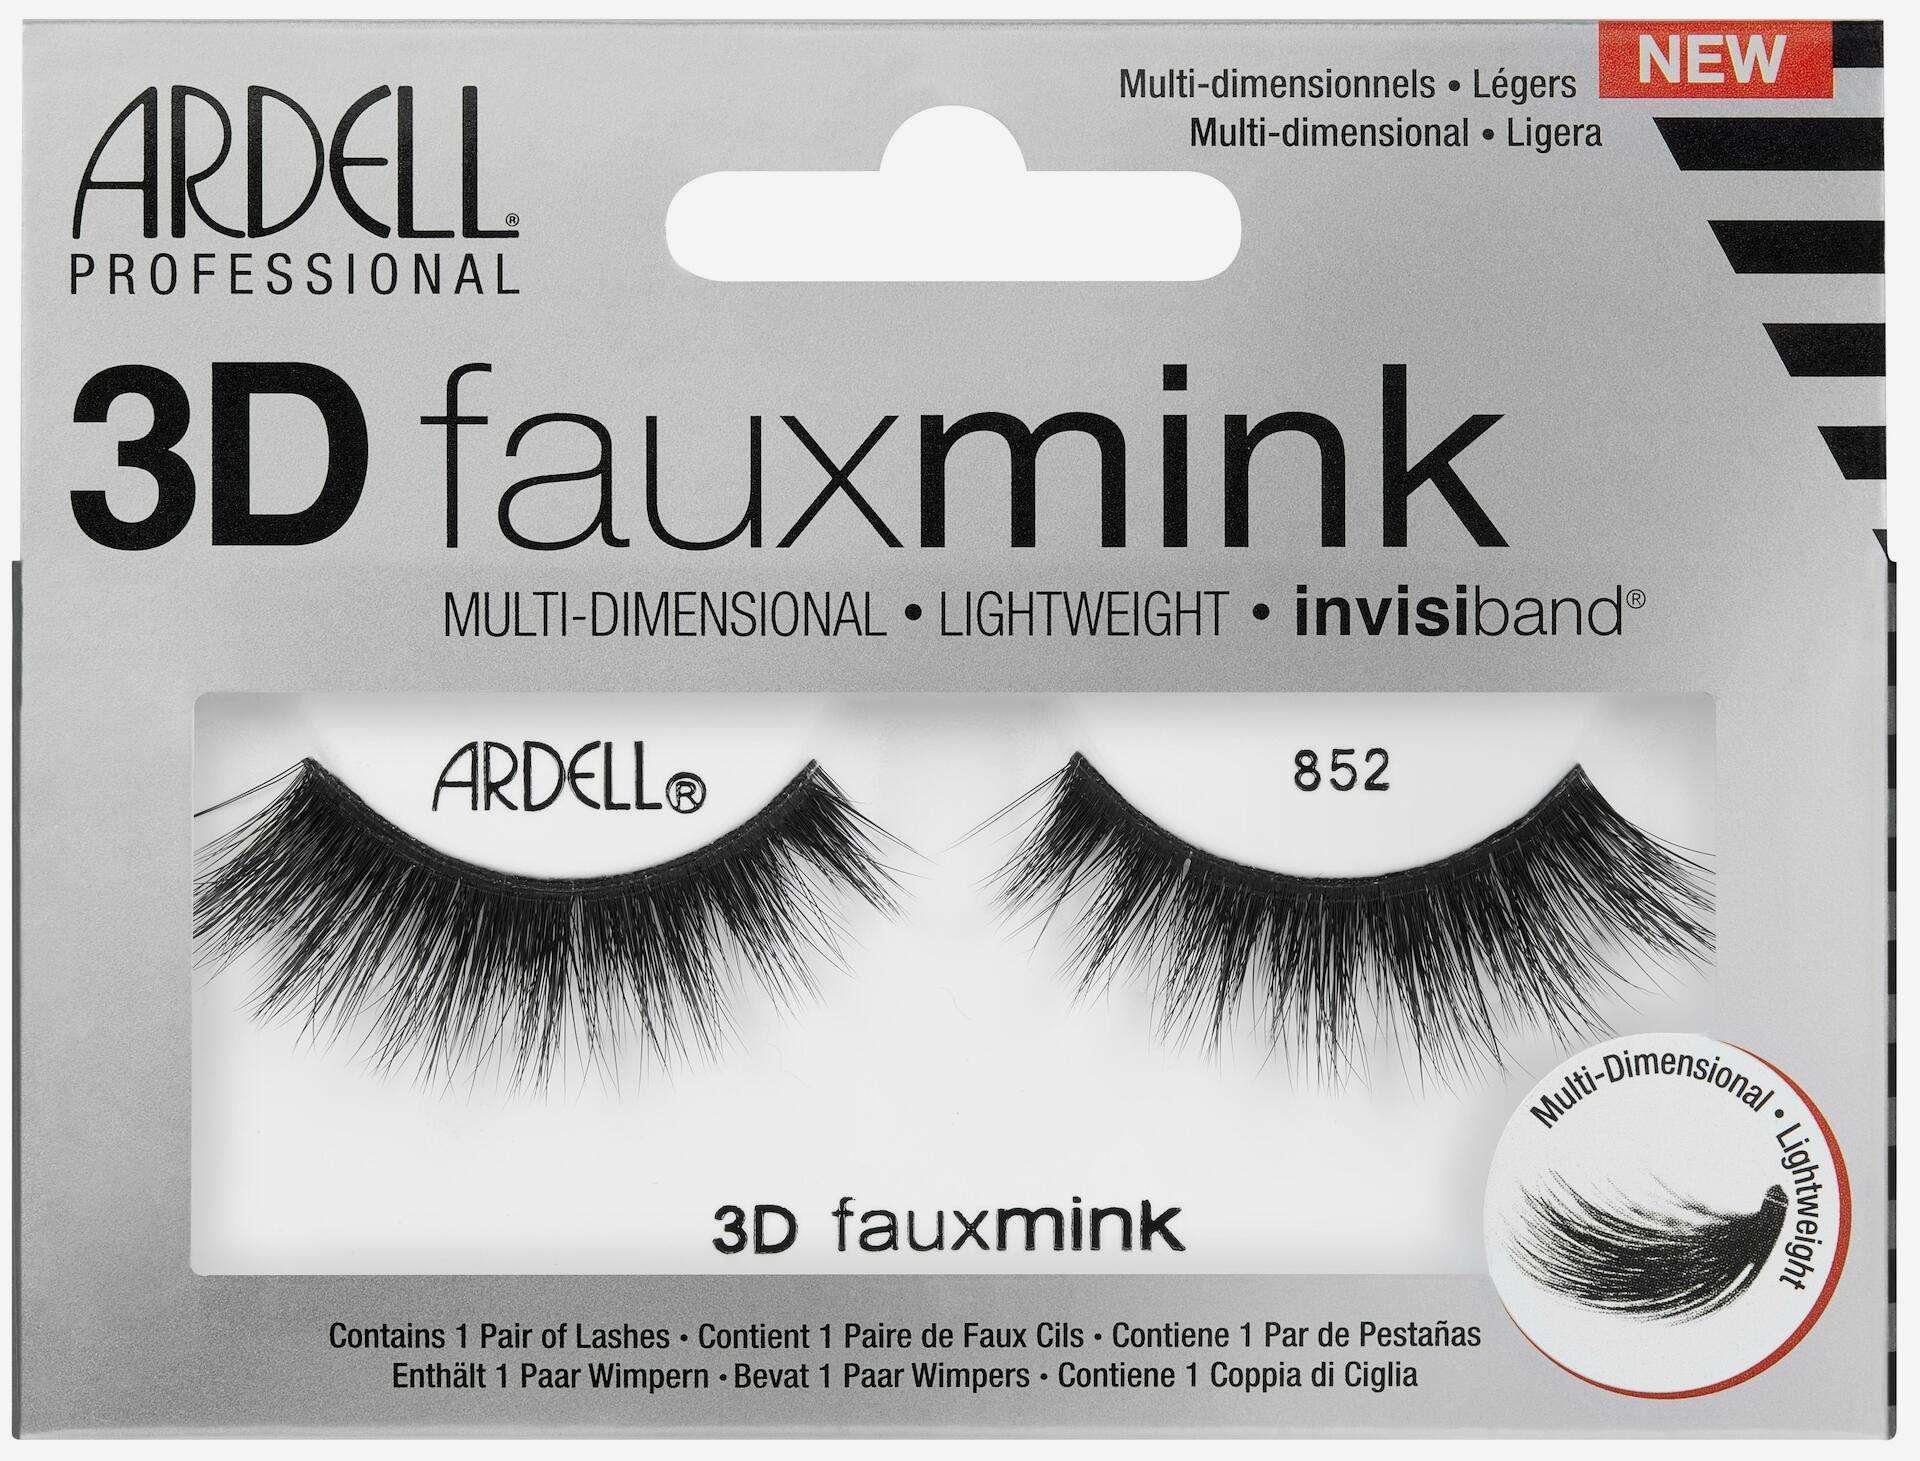 c4dded3d0cb 3D Faux Mink False Lashes 852 - Ardell - KICKS